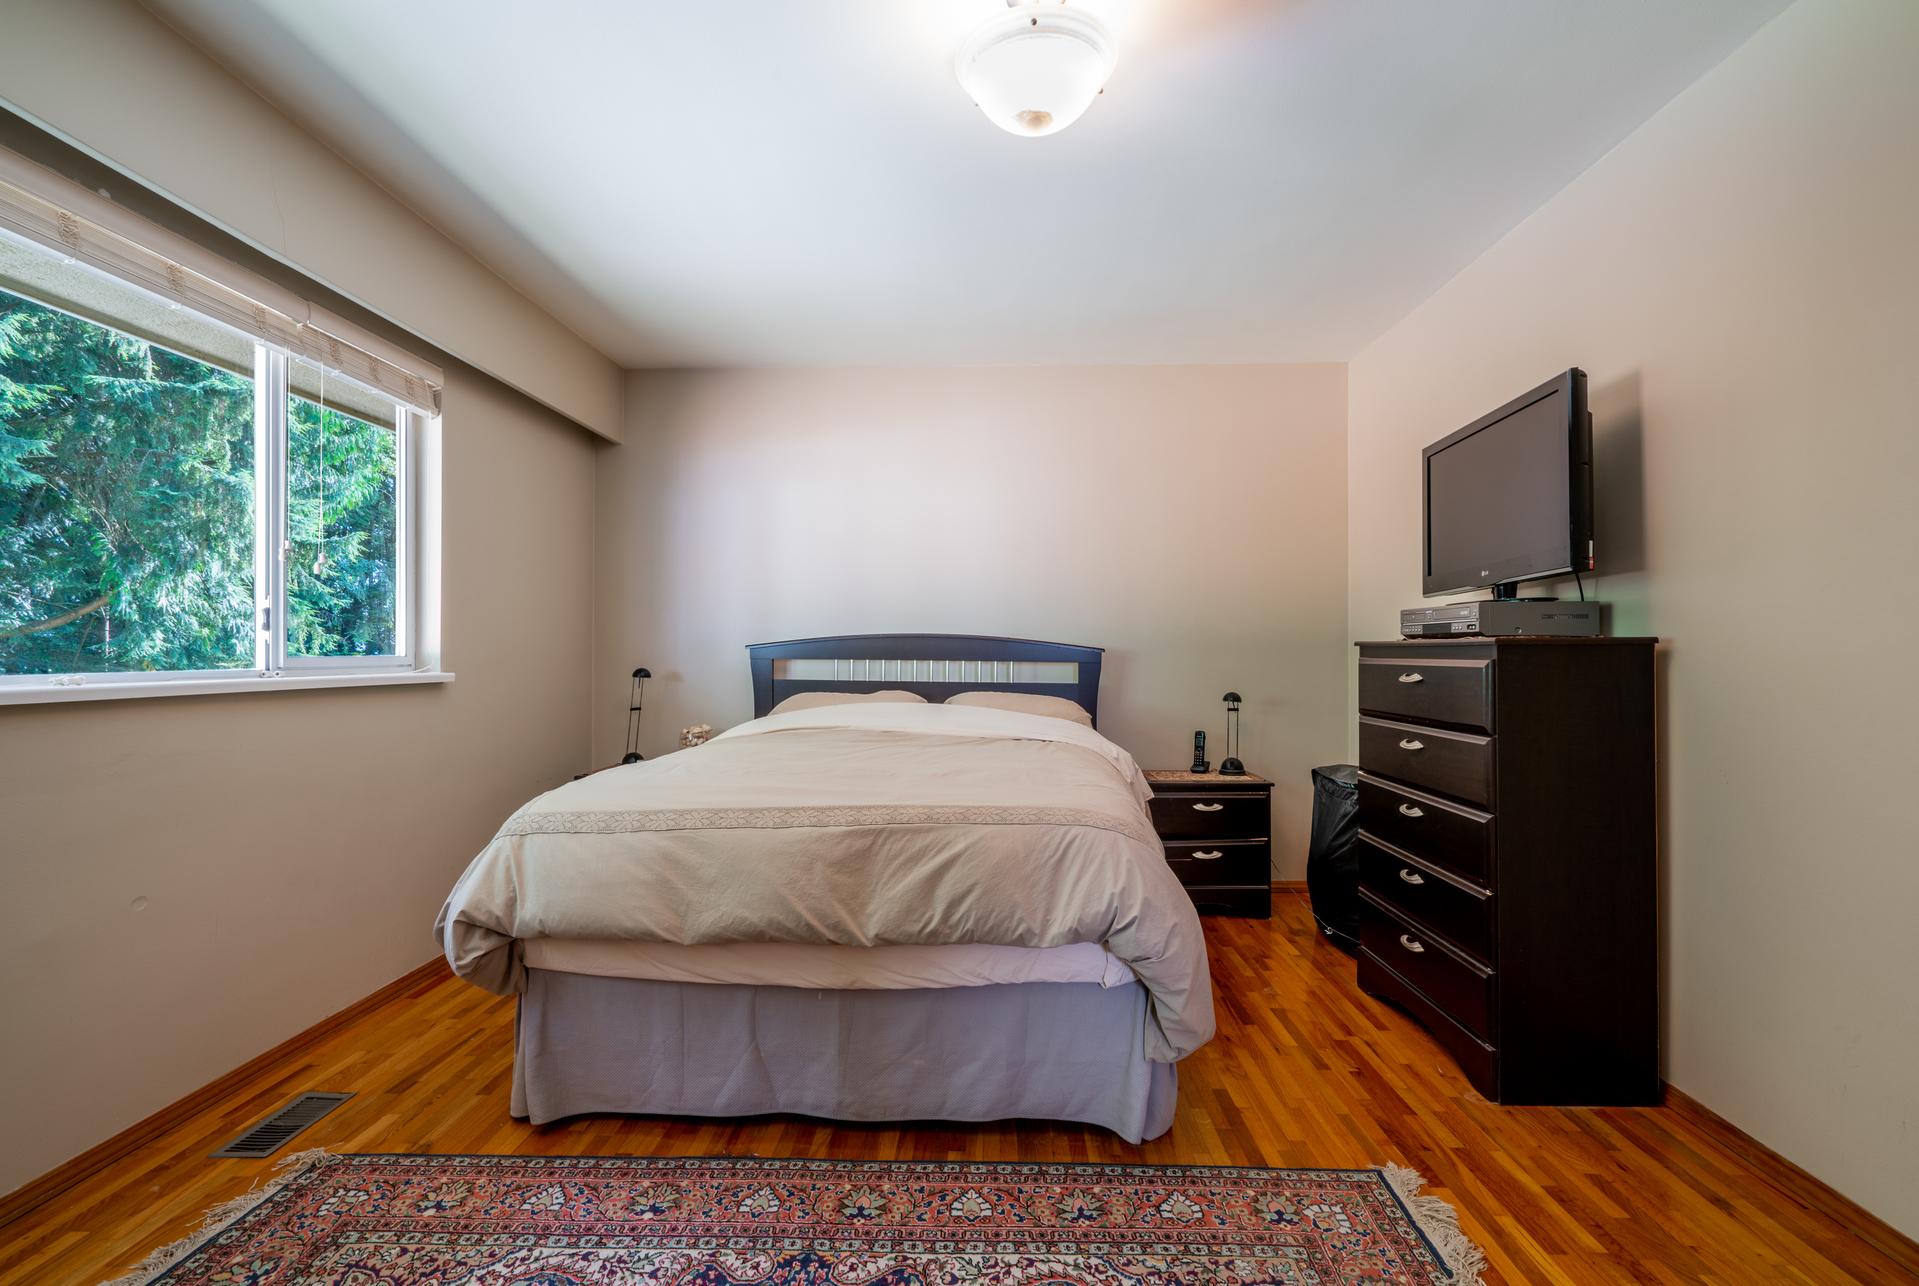 4034-delbrook-avenue-north-vancouver-18 at 4034 Delbrook Avenue, Upper Delbrook, North Vancouver